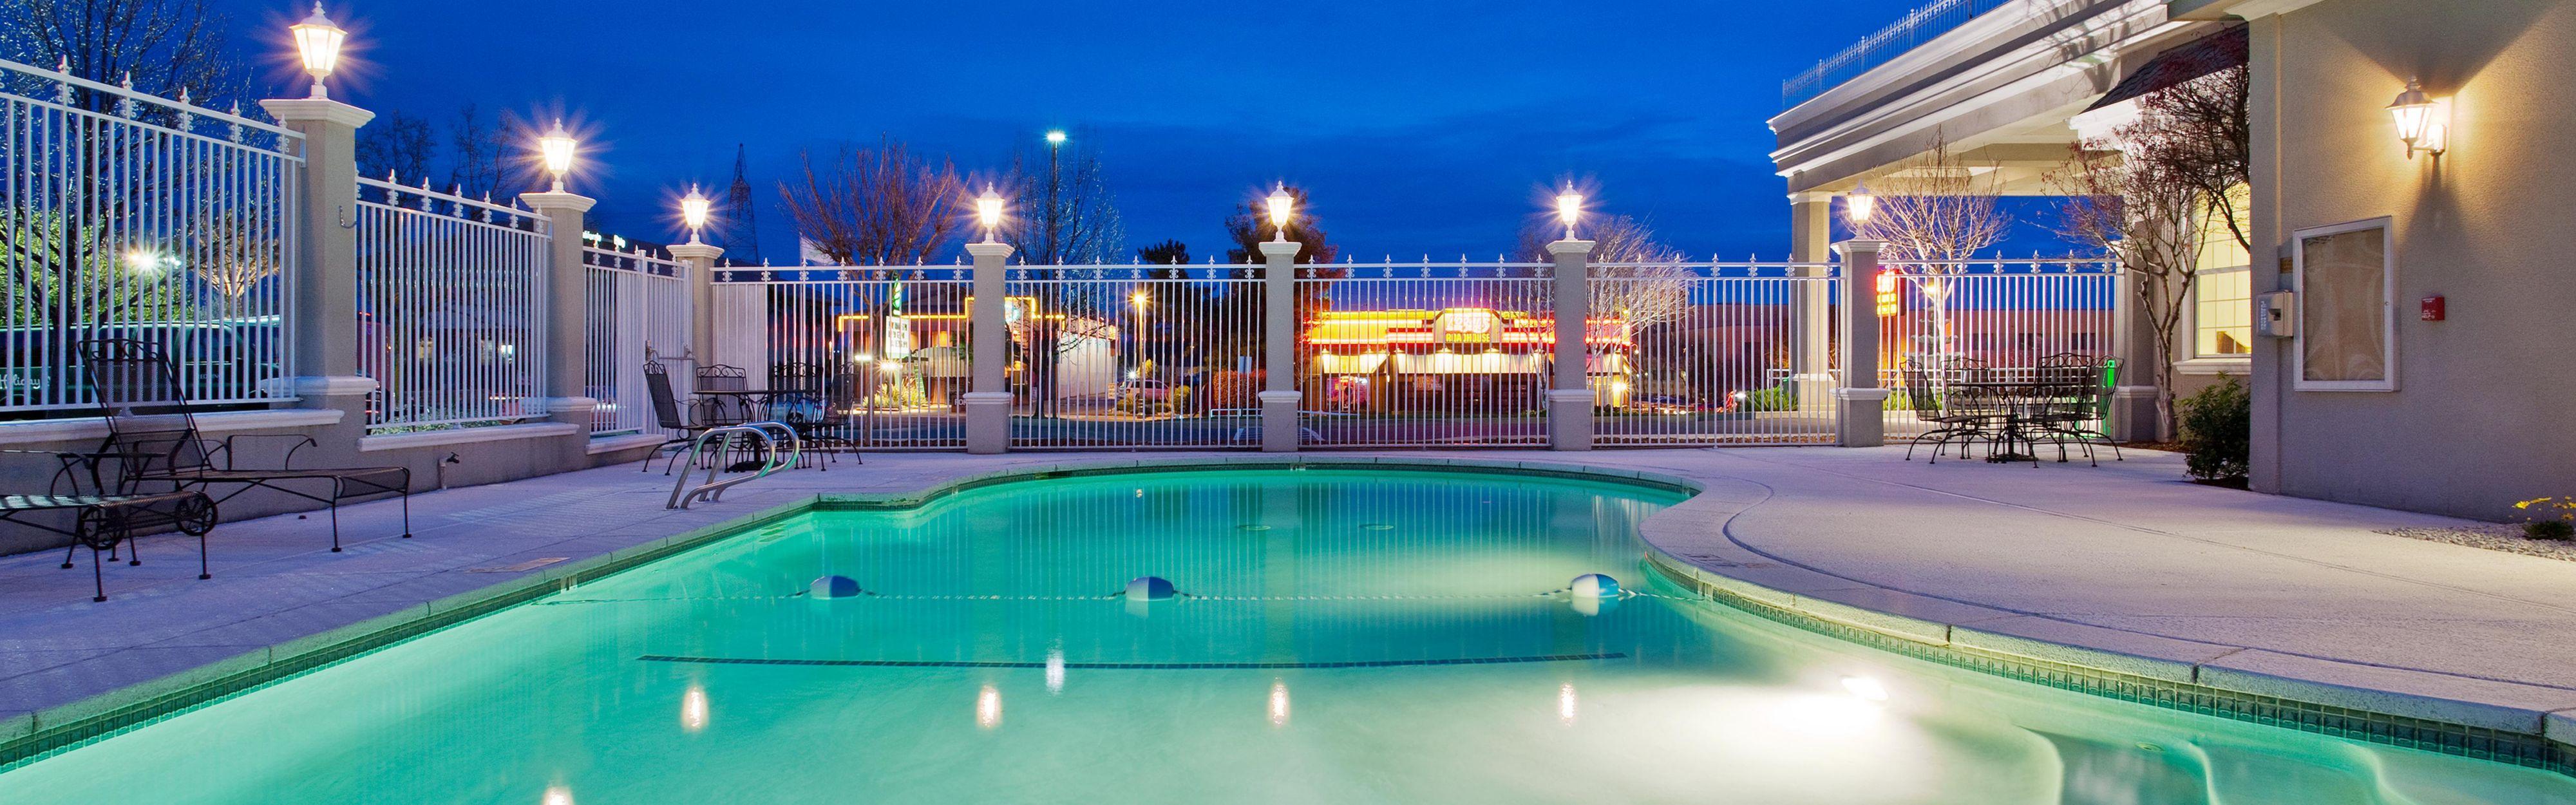 Holiday Inn Redding image 2